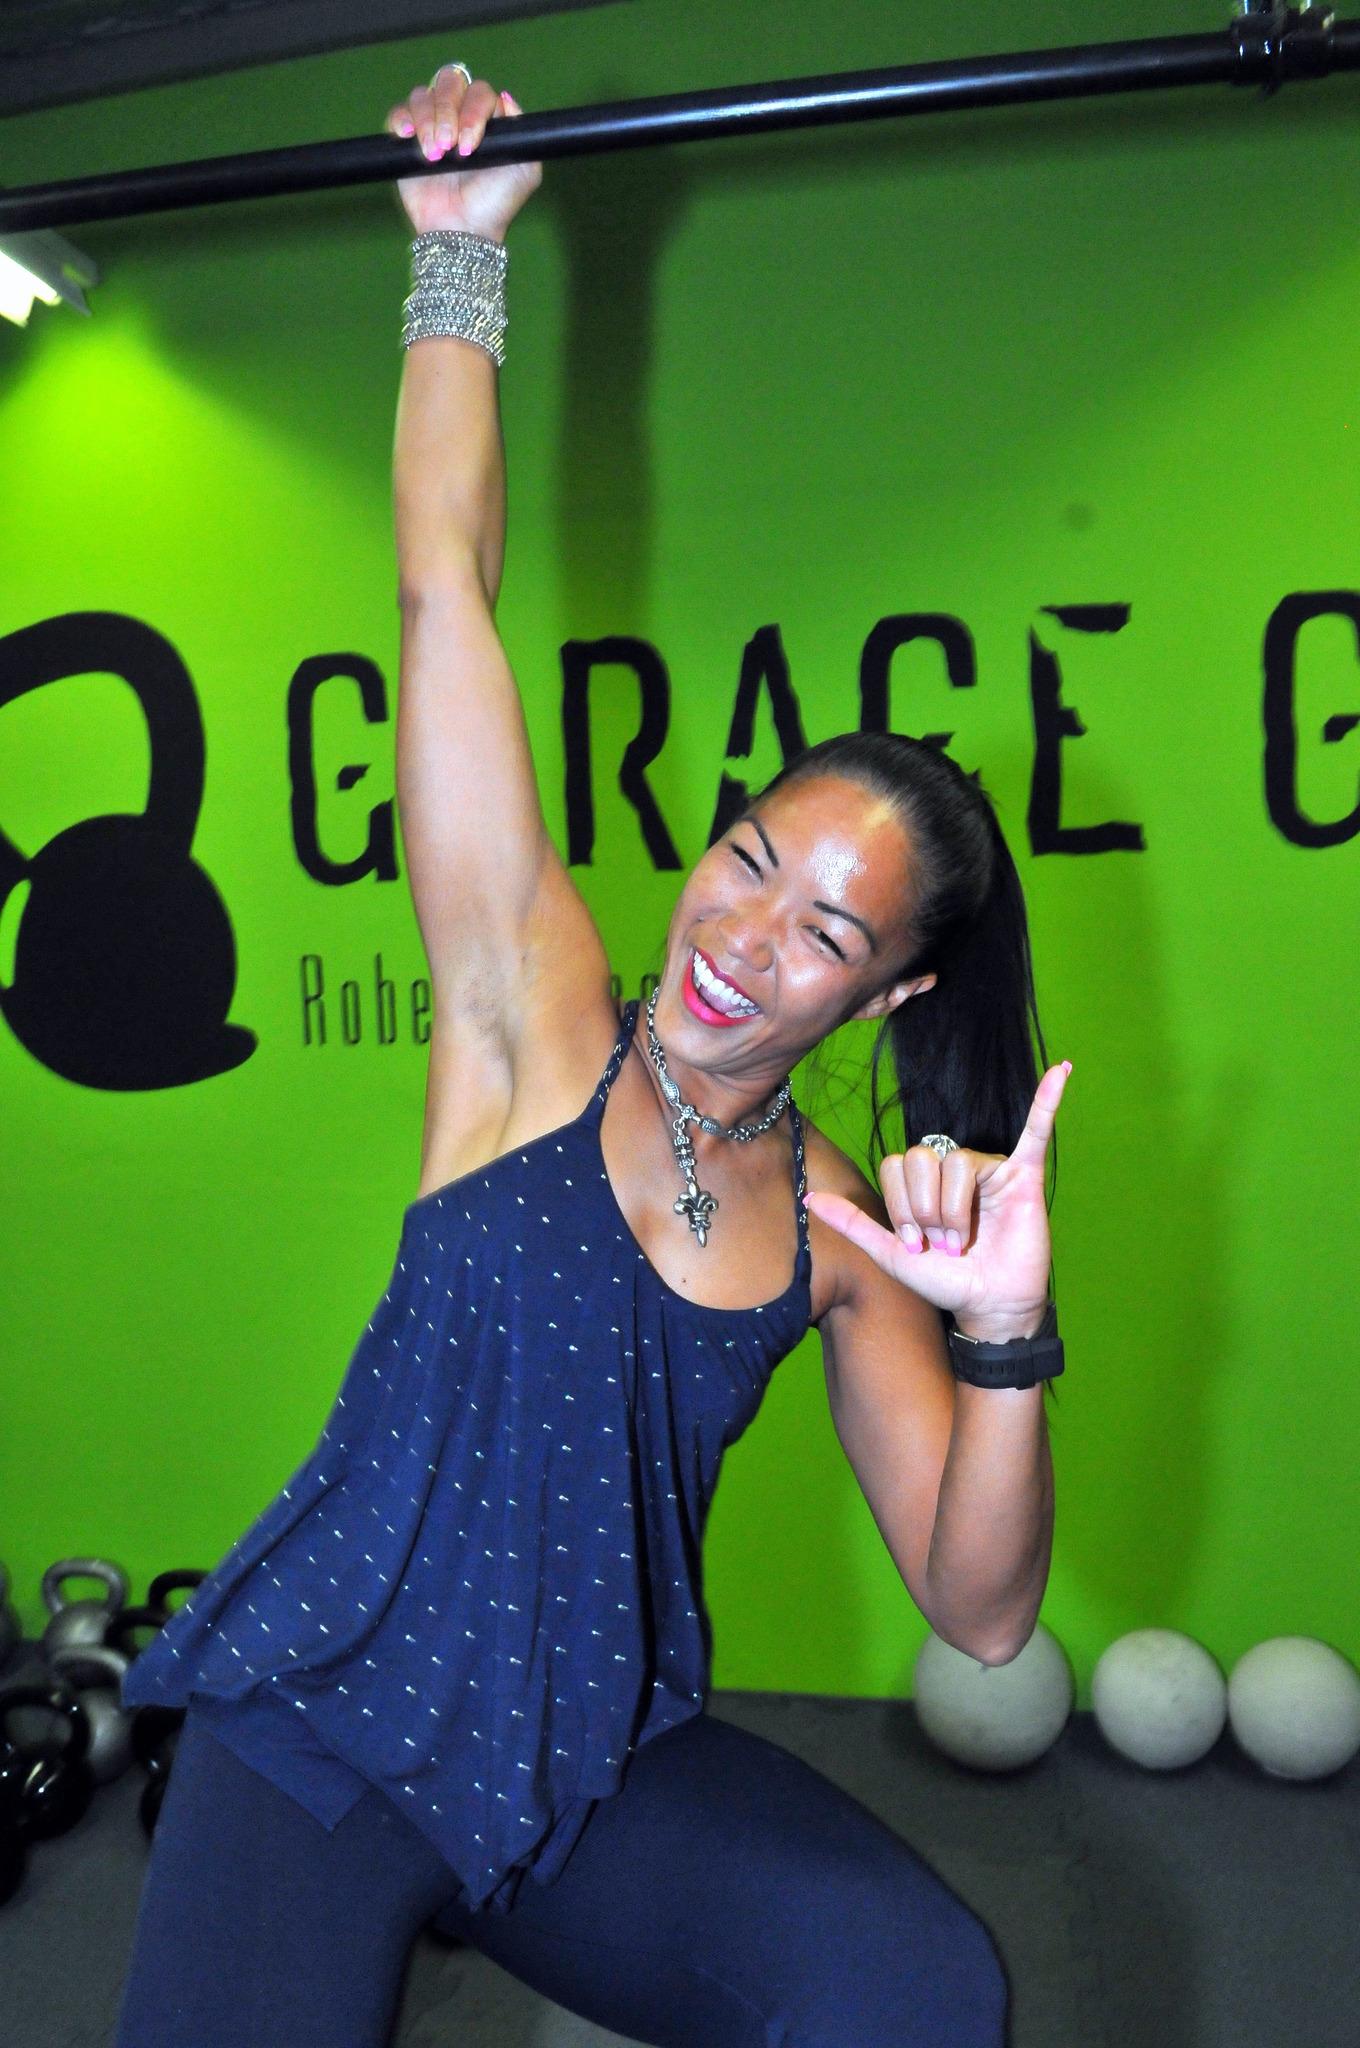 Garage gym eröffnet in der ungargasse landstraße